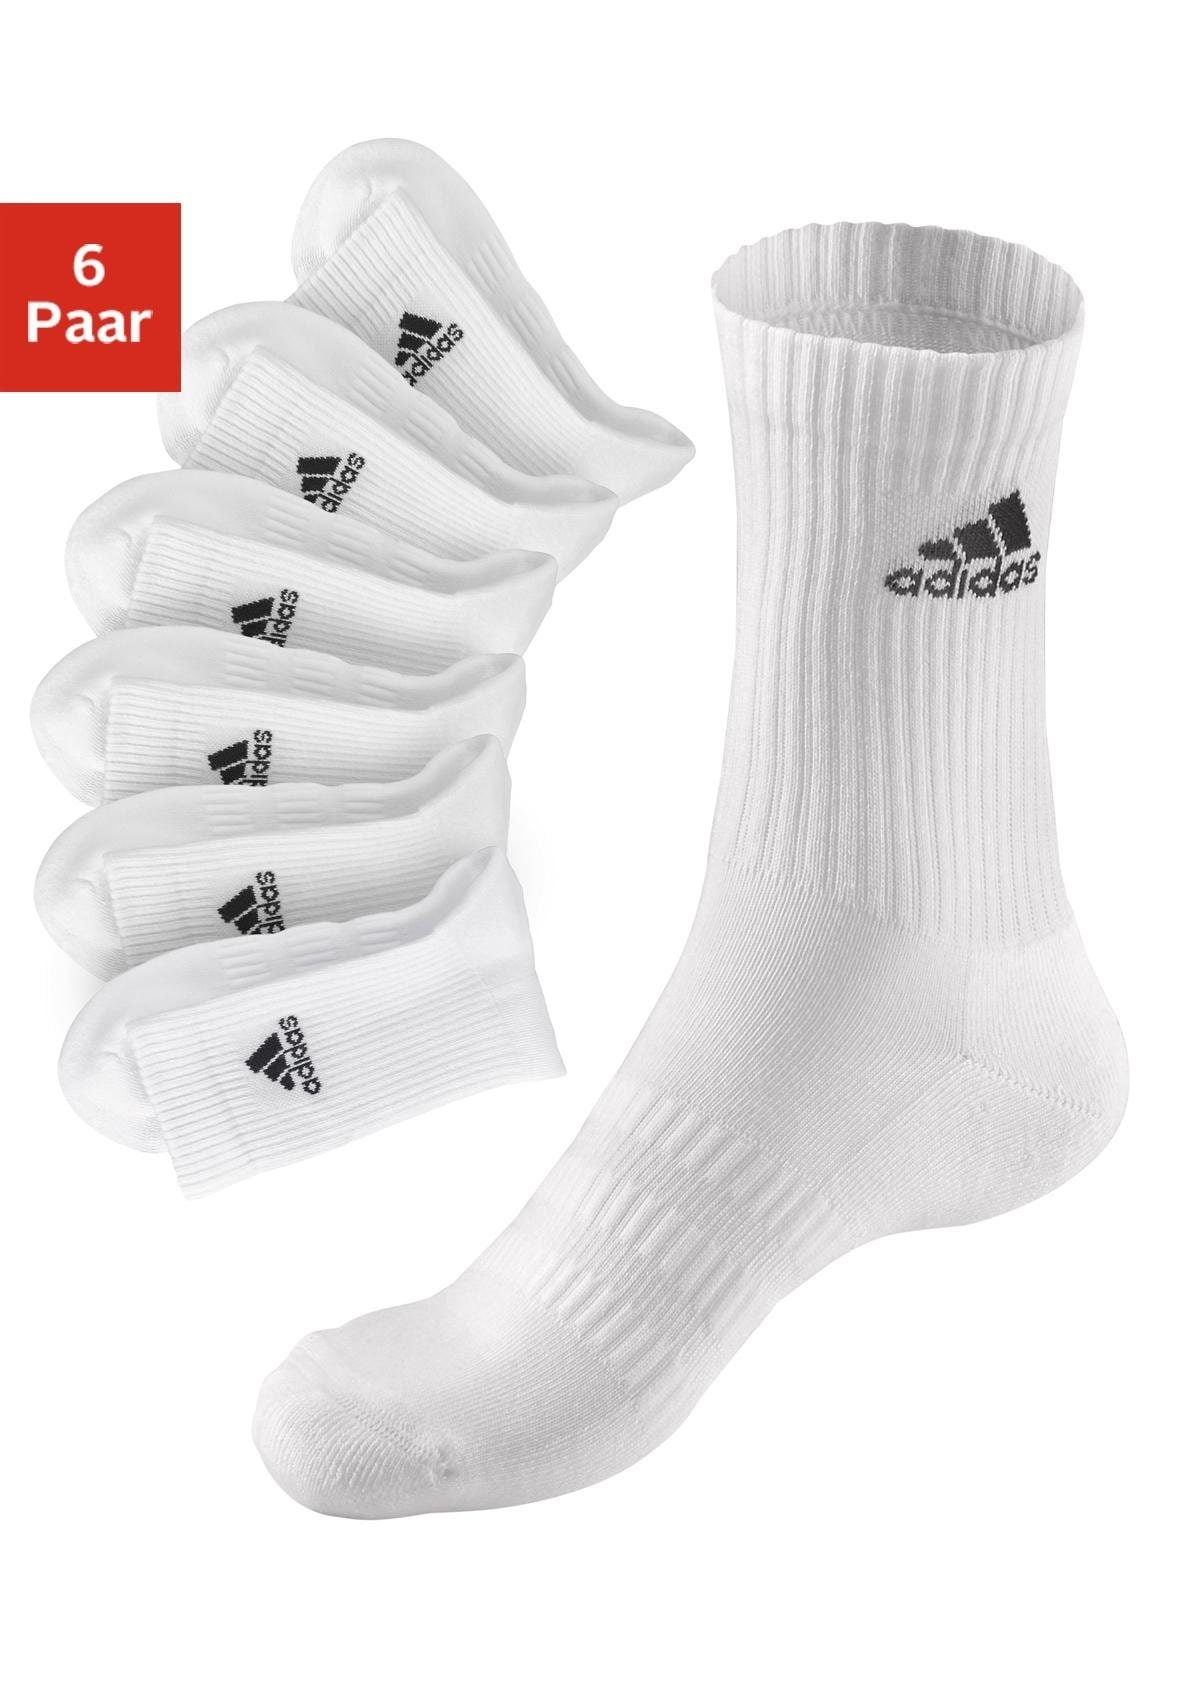 adidas Performance Tennissocken (6 Paar) Herrenmode/Wäsche & Bademode/Wäsche/Socken/Sportsocken/Tennissocken